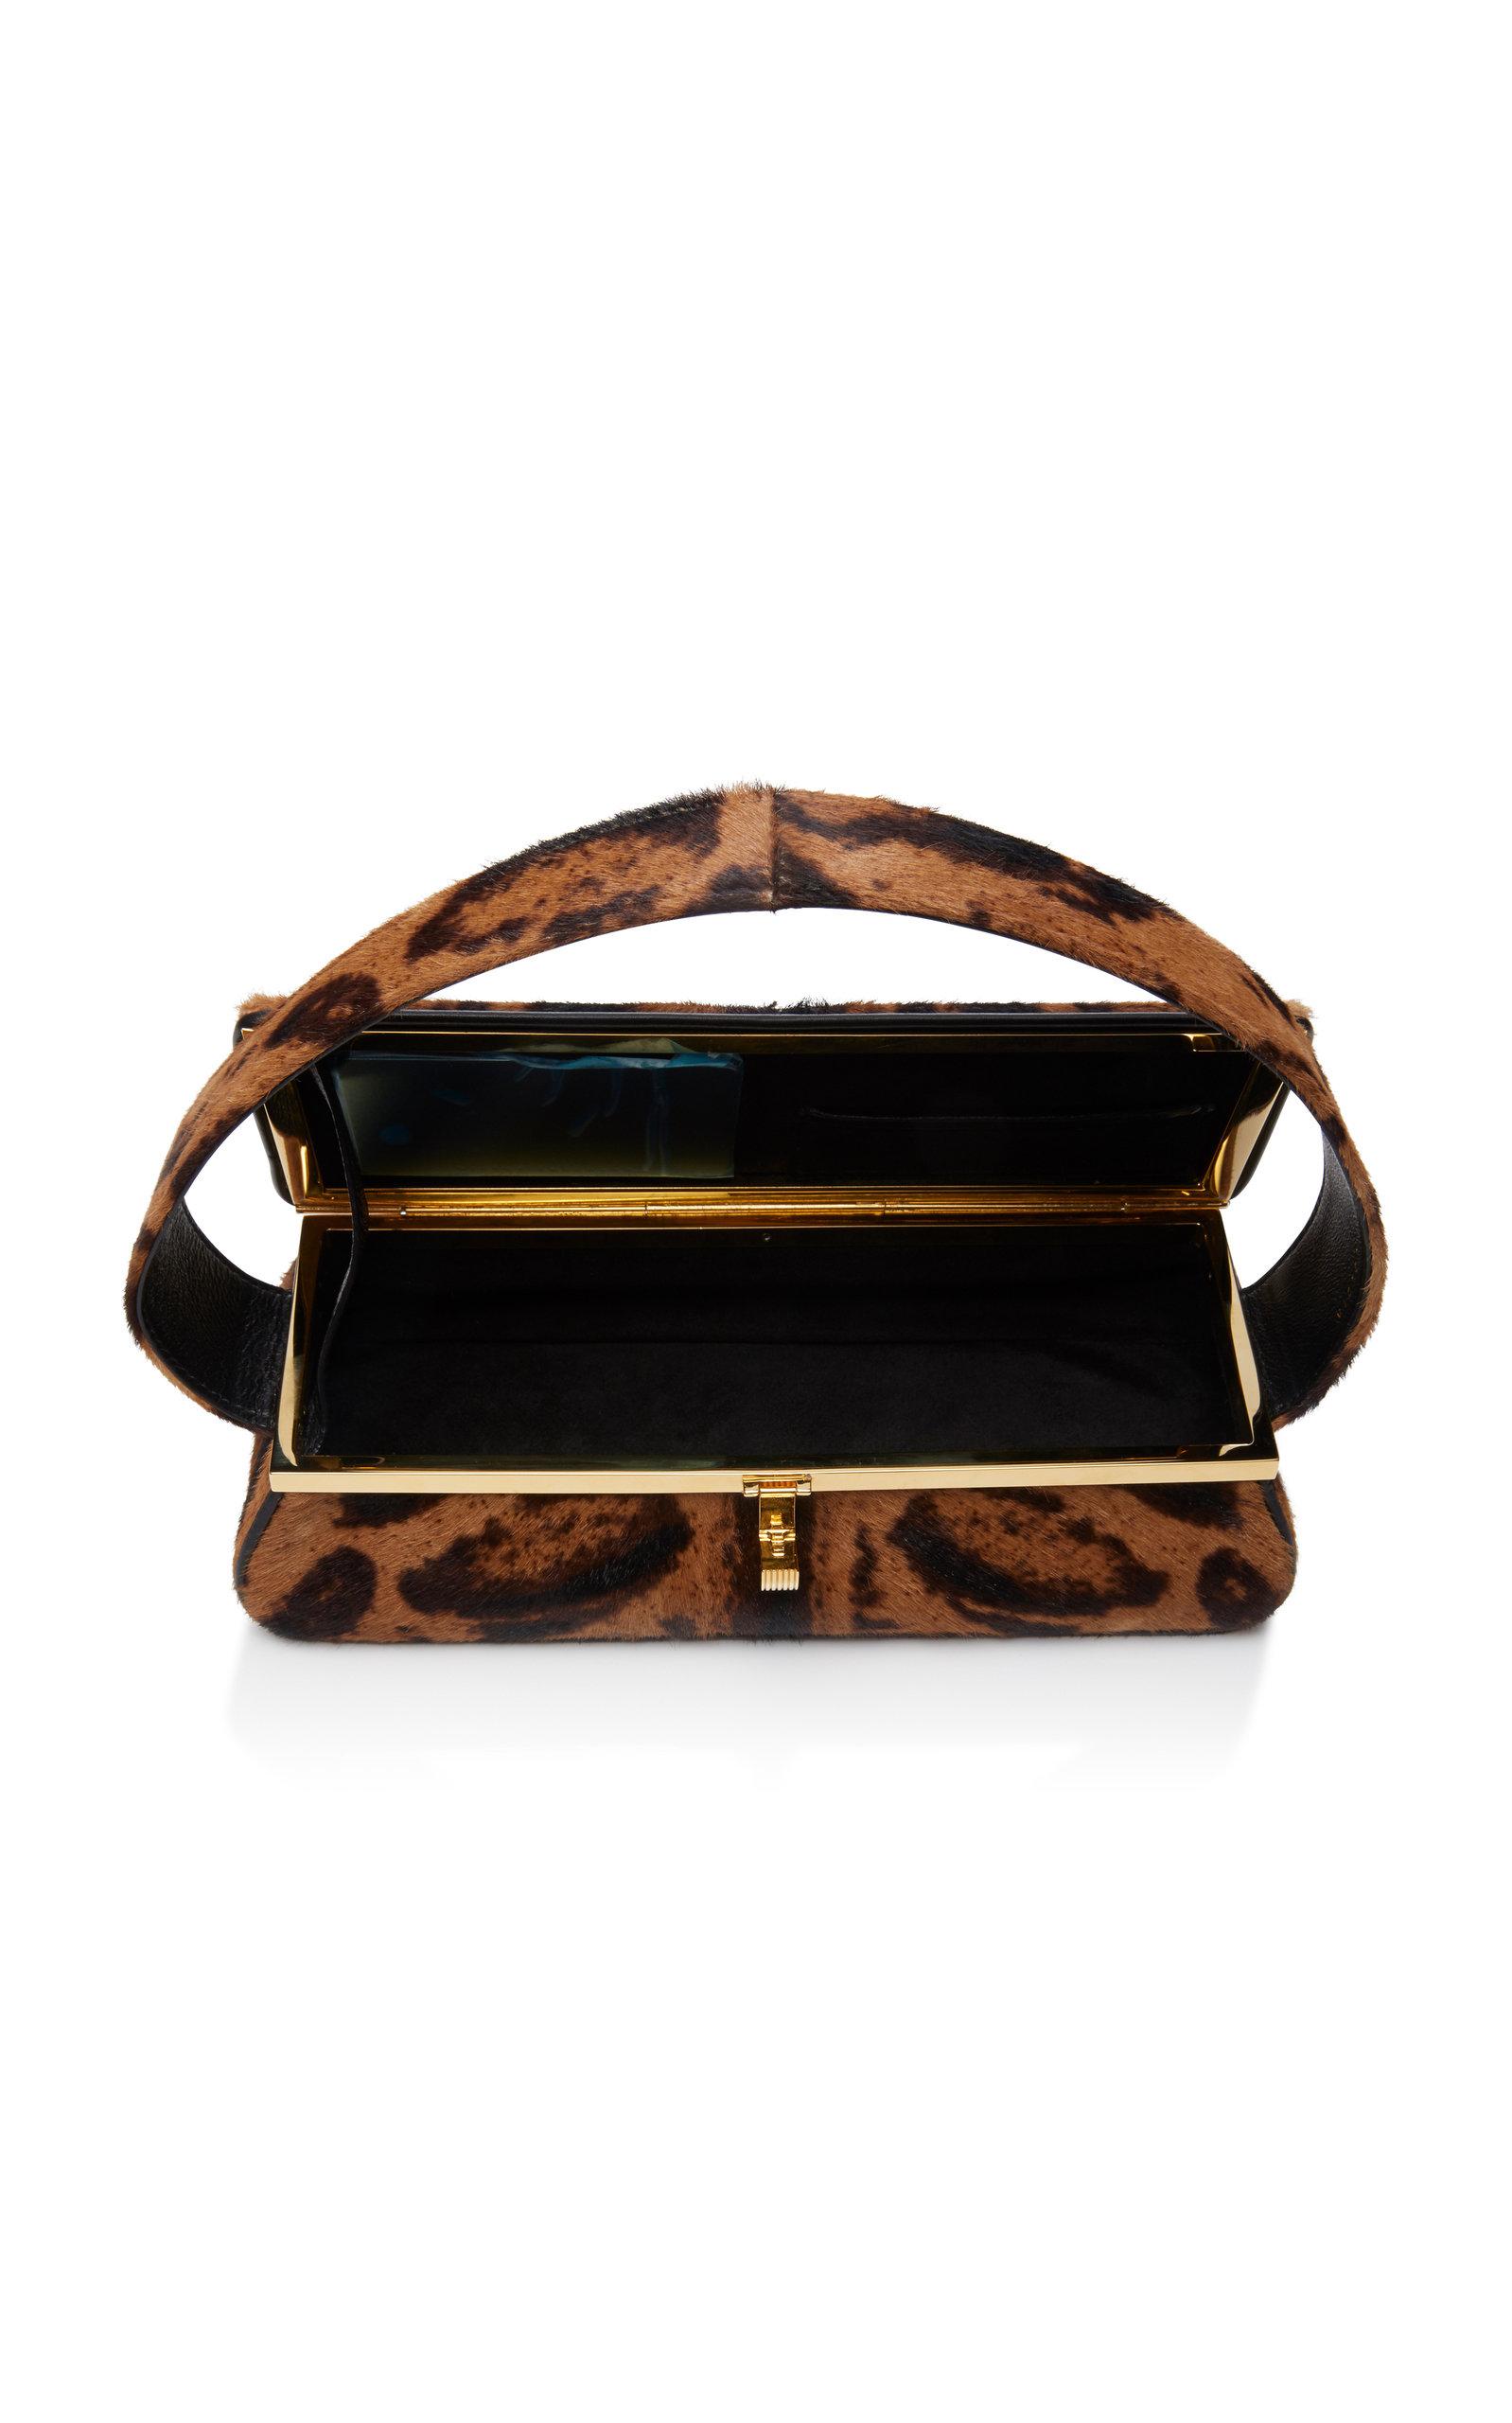 5584bb35ed4e Victoria BeckhamPowder Leopard-Print Calf Hair Clutch. CLOSE. Loading.  Loading. Loading. Loading